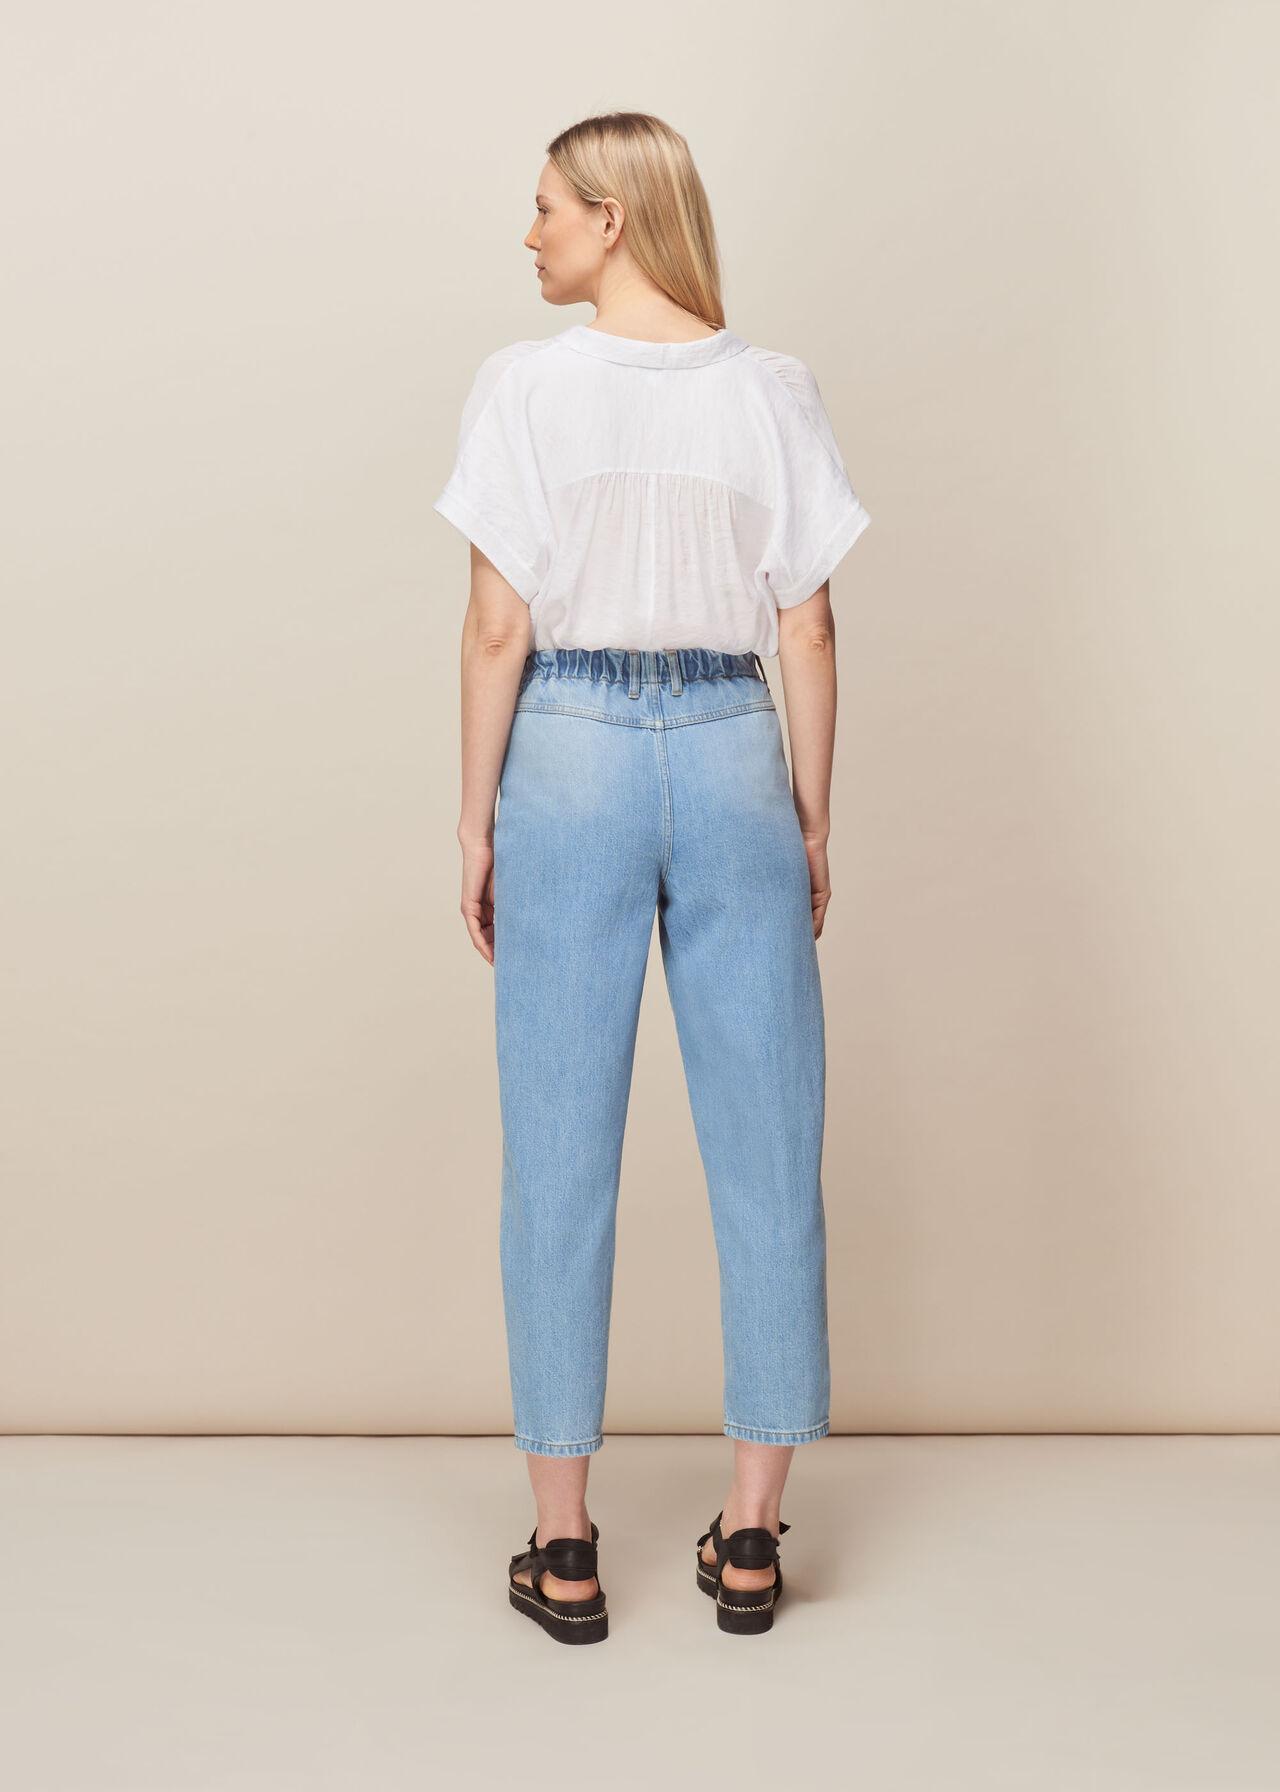 Elasticated Waist Soft Jean Denim